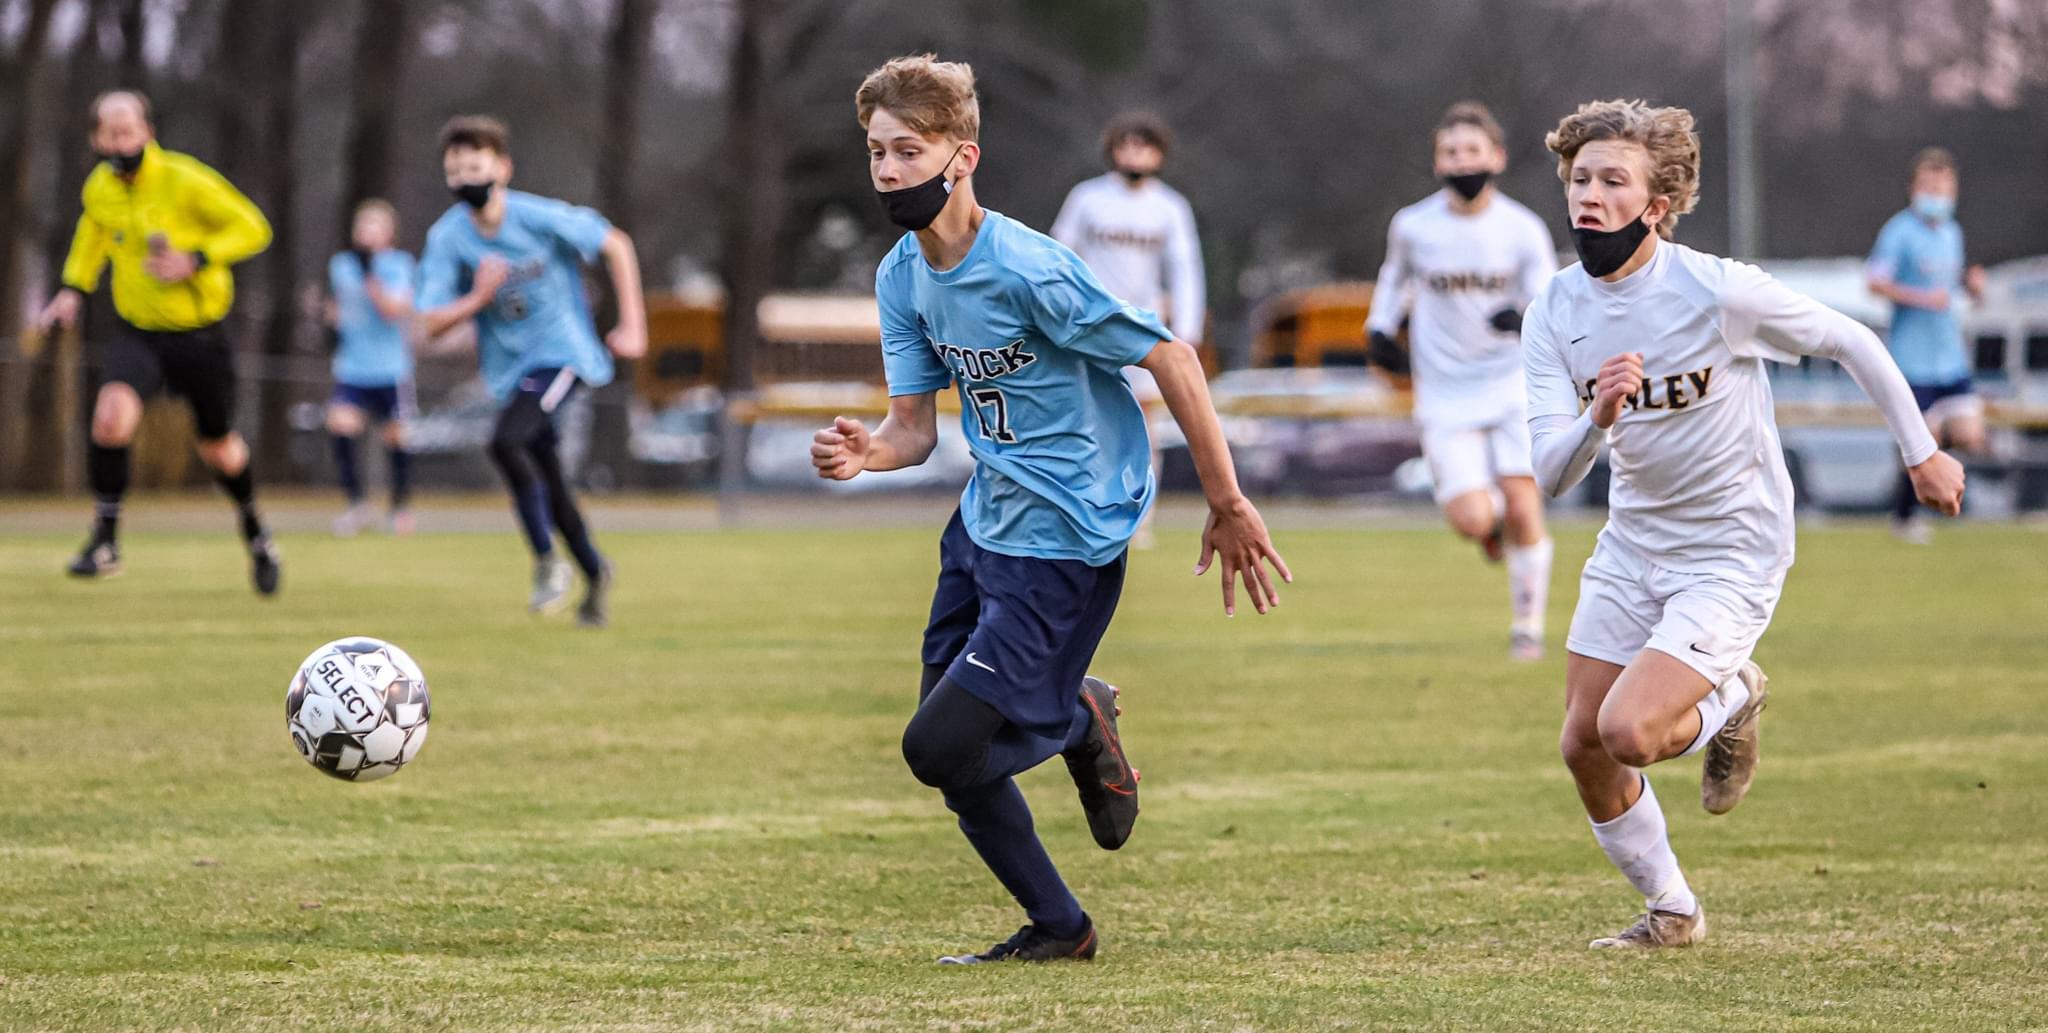 Boys Soccer: D.H. Conley Turns Back C.B. Aycock (PHOTO GALLERY)